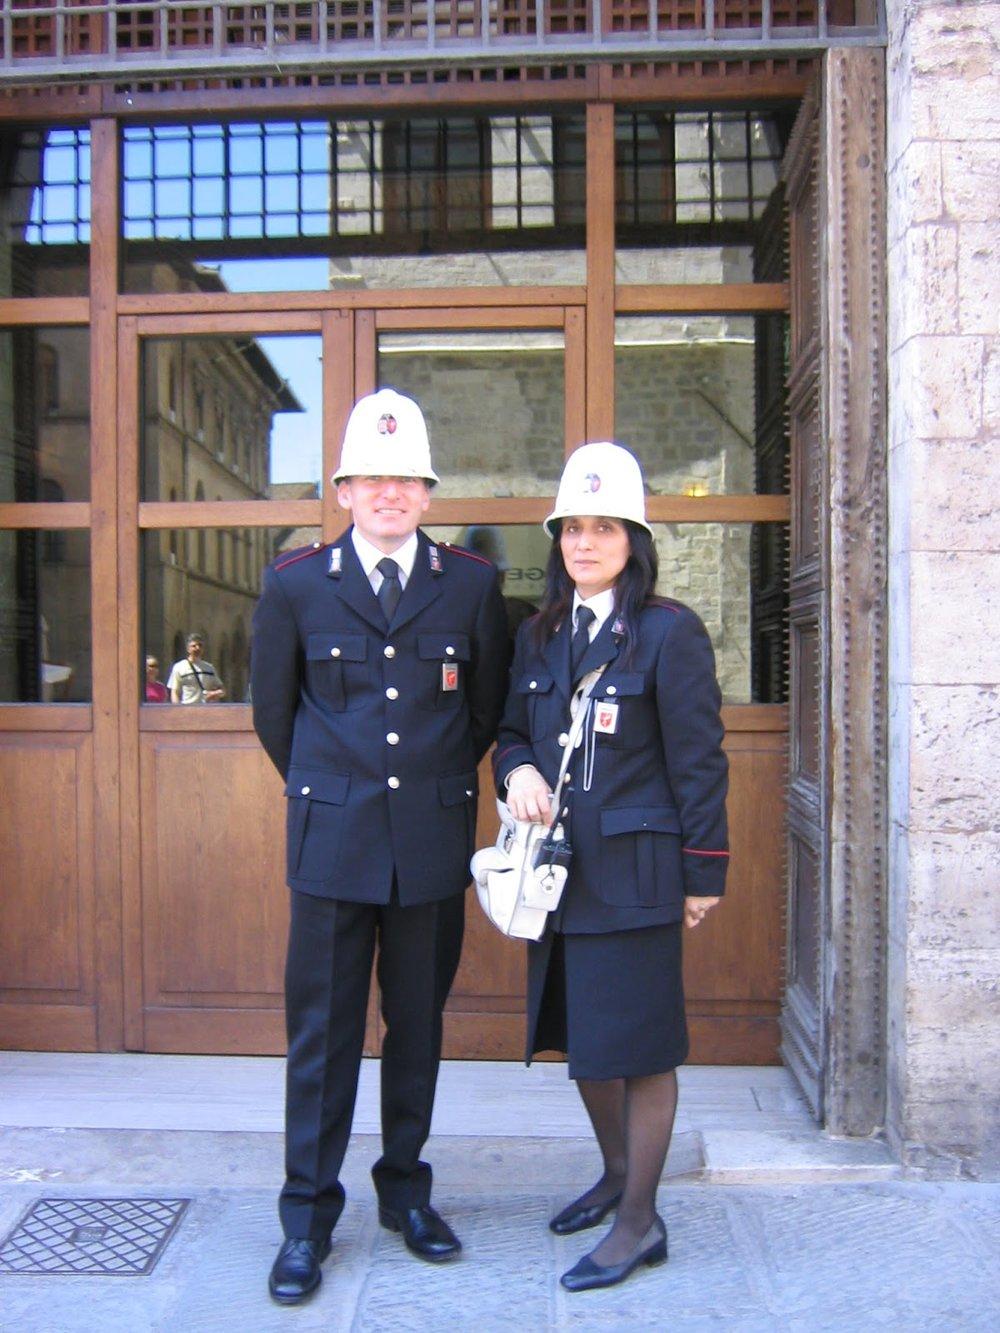 Perugia, April 2005, © Tiffany Parks